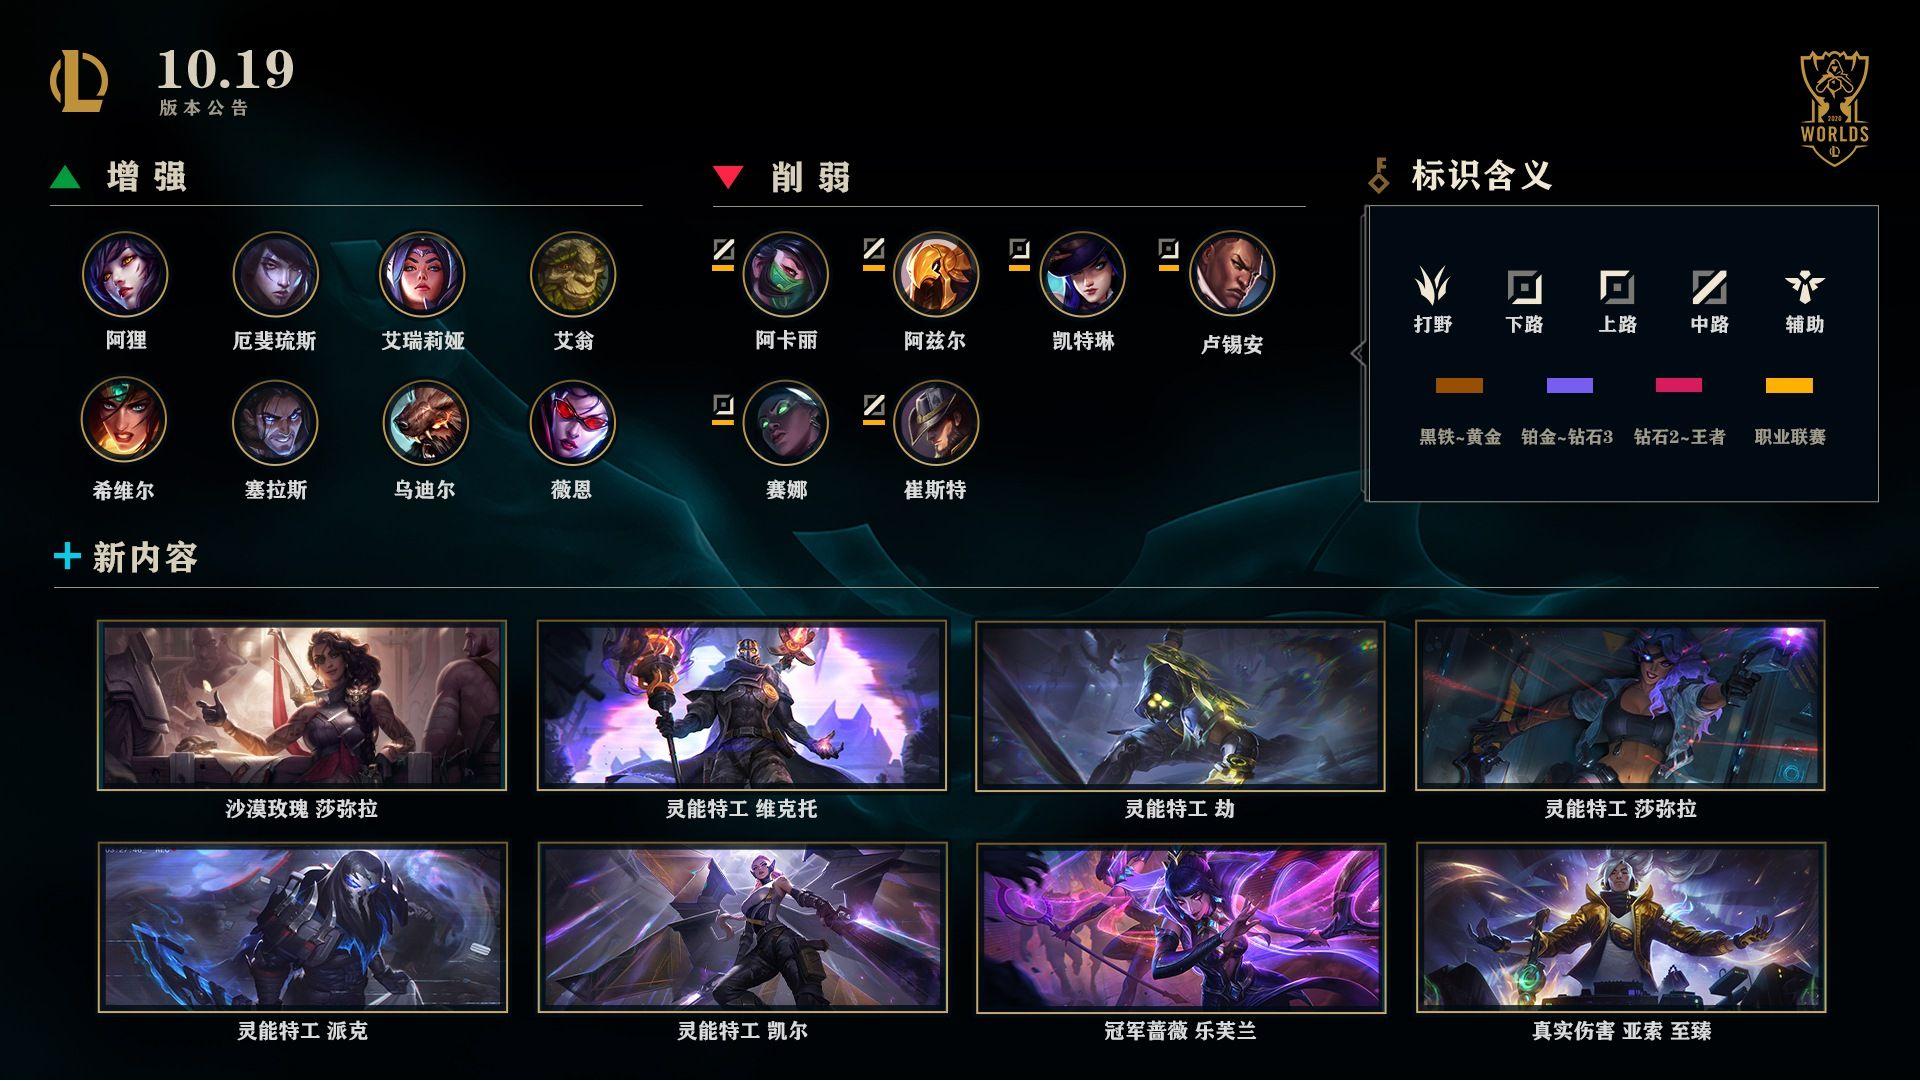 S10版本各位置英雄解析 卢仙或再次成为热门选择-1